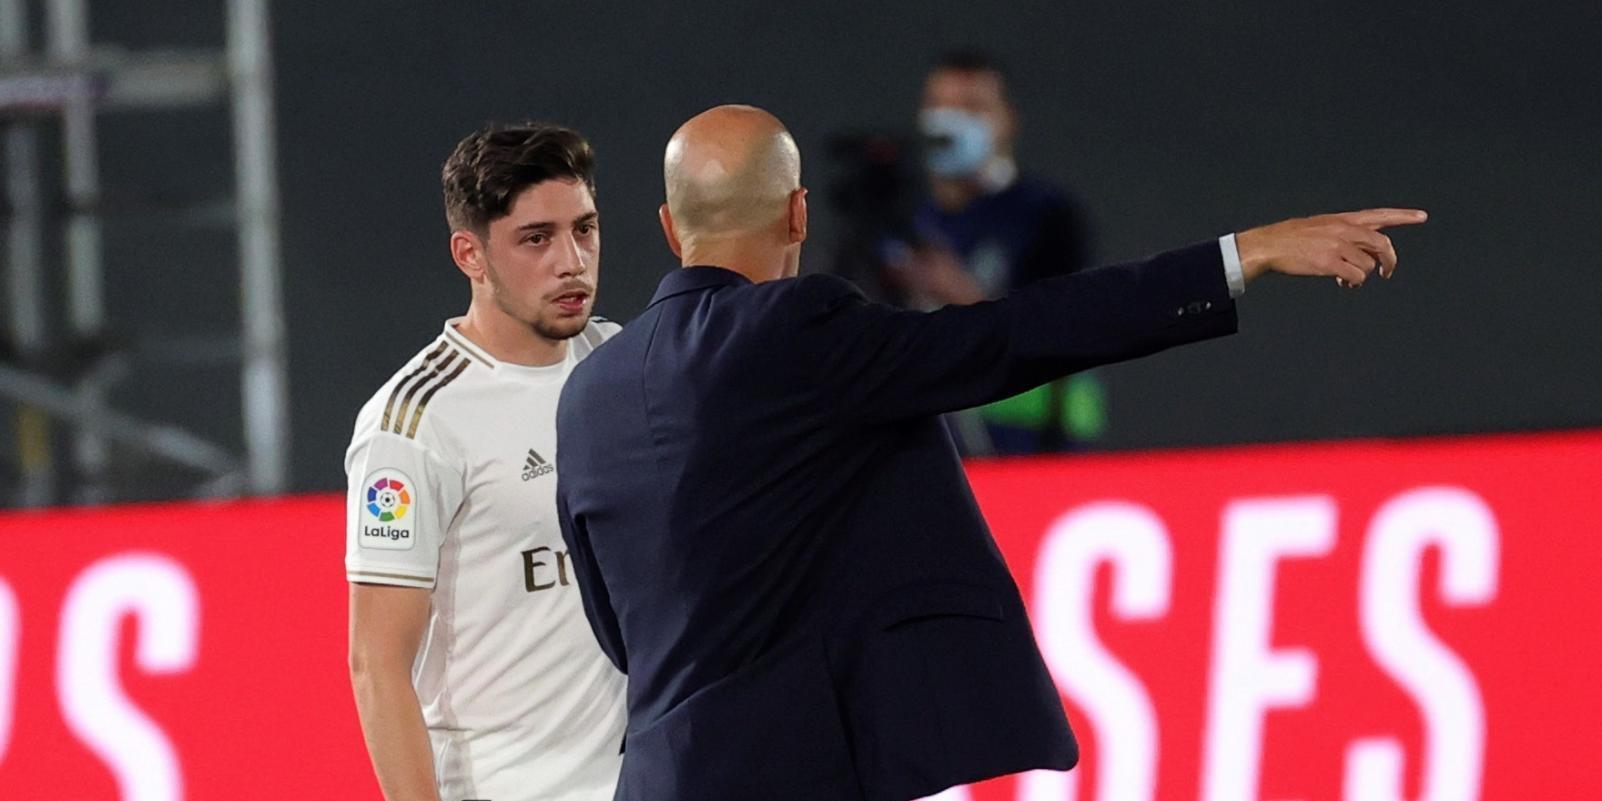 Zidane tampoco contará con Valverde, aislado por contacto con un positivo